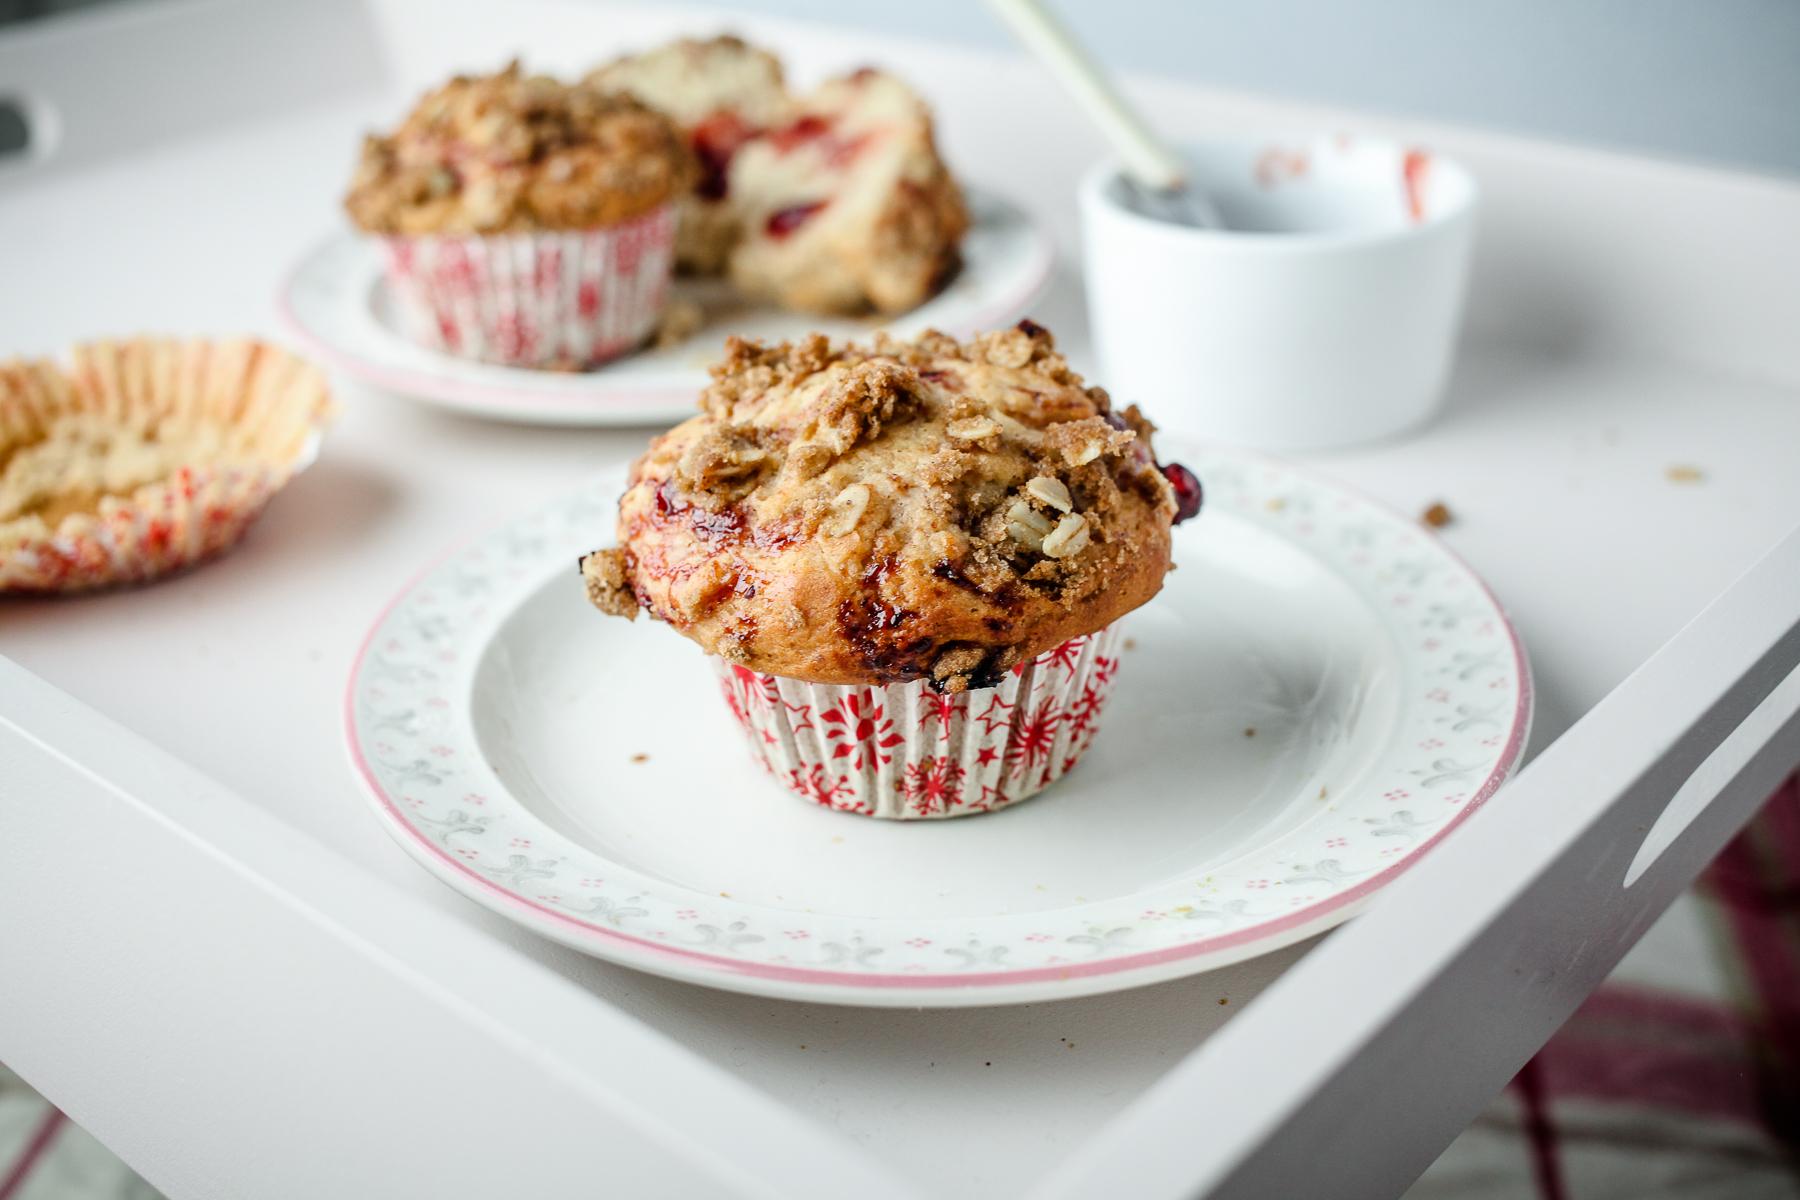 muffinscranberry-1009